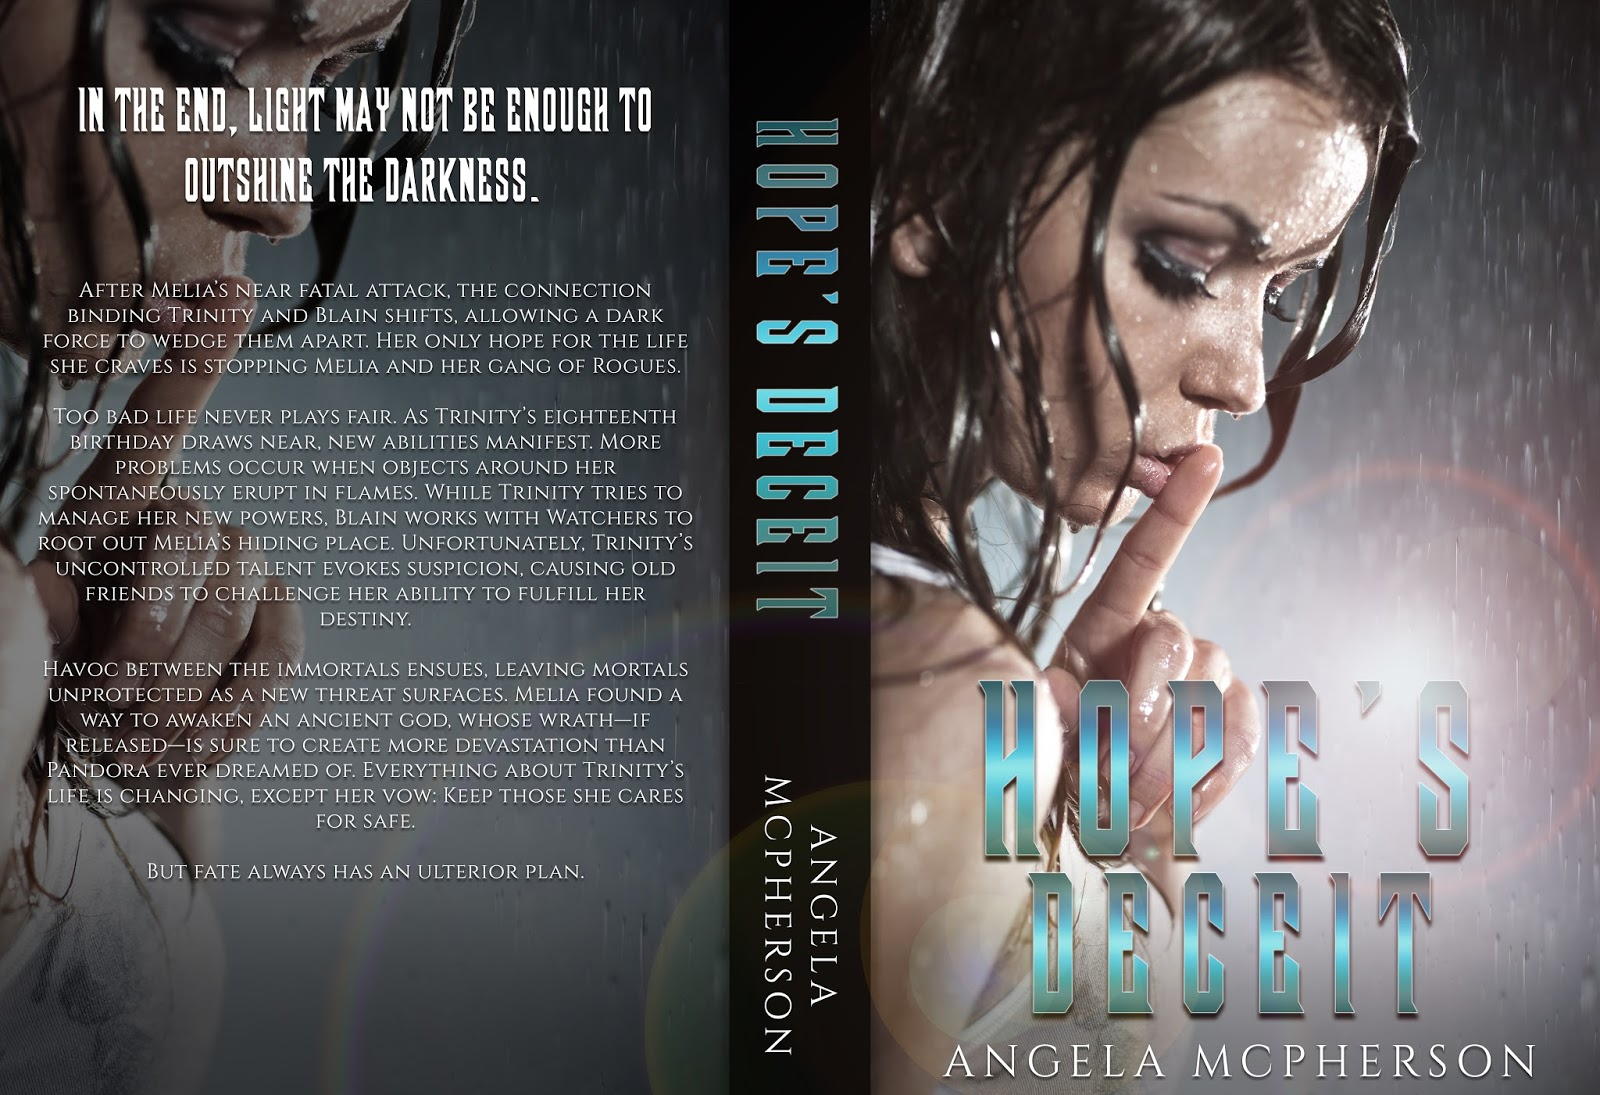 Angela Mcpherson – Angela McPherson Romance Author